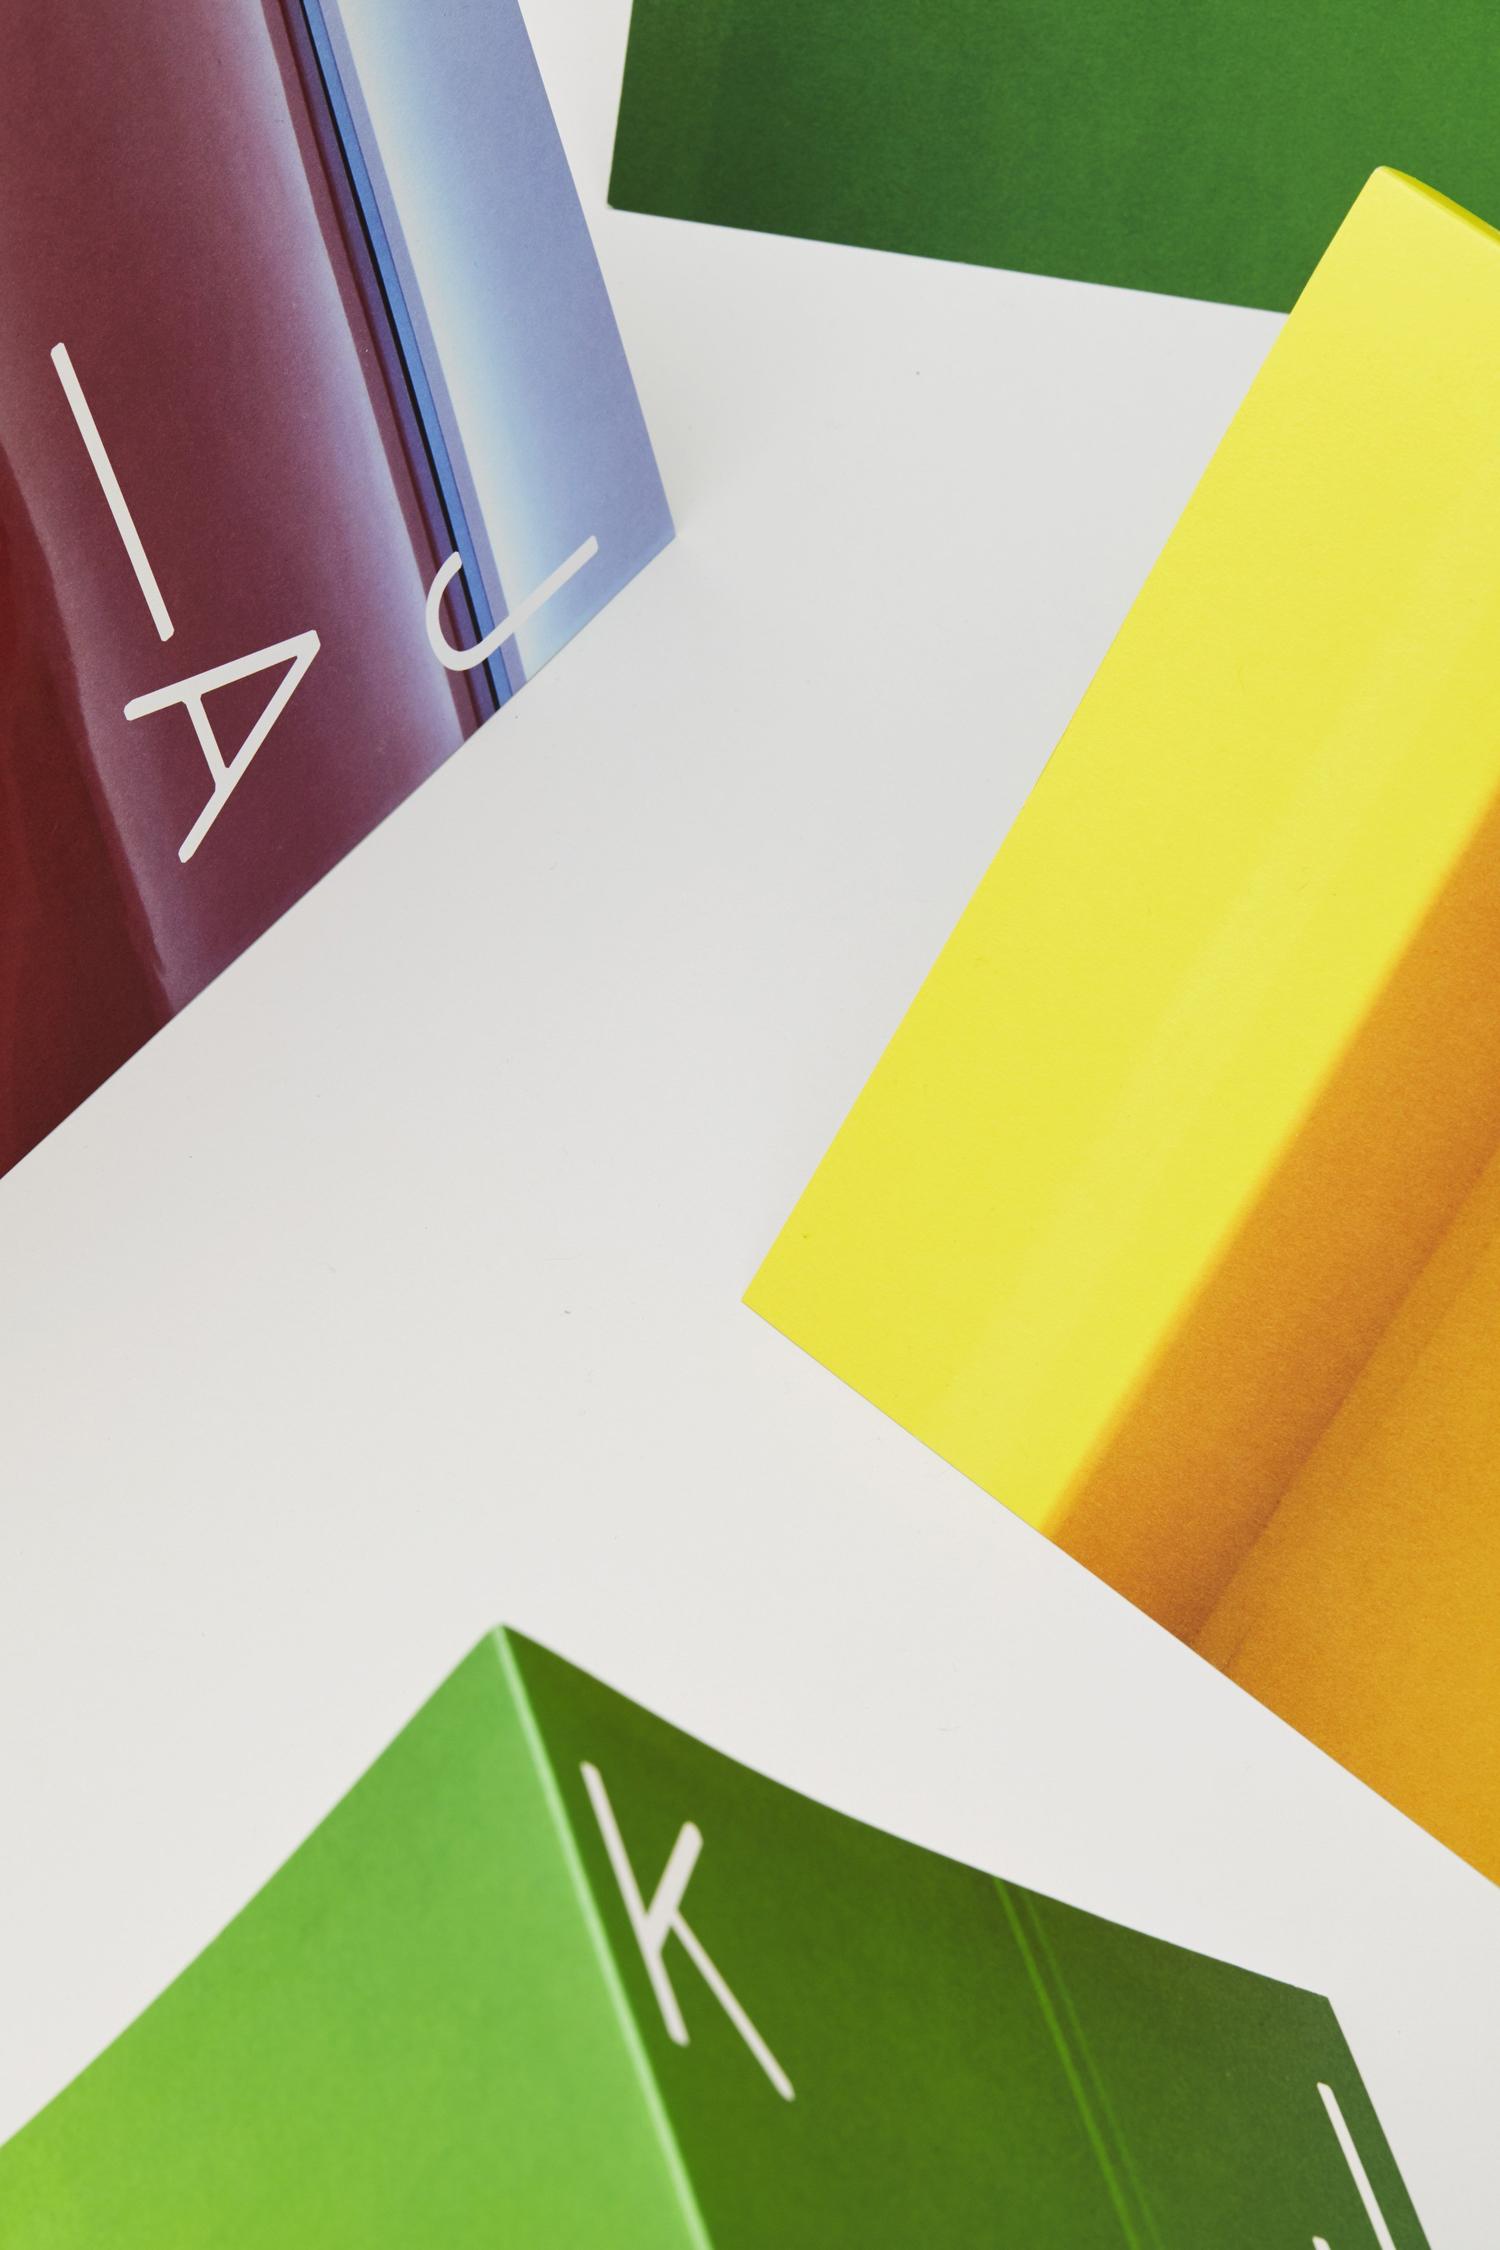 06-Kristin-Jarmund-Architects-Branding-Logo-Print-Design-Snøhetta-Norway